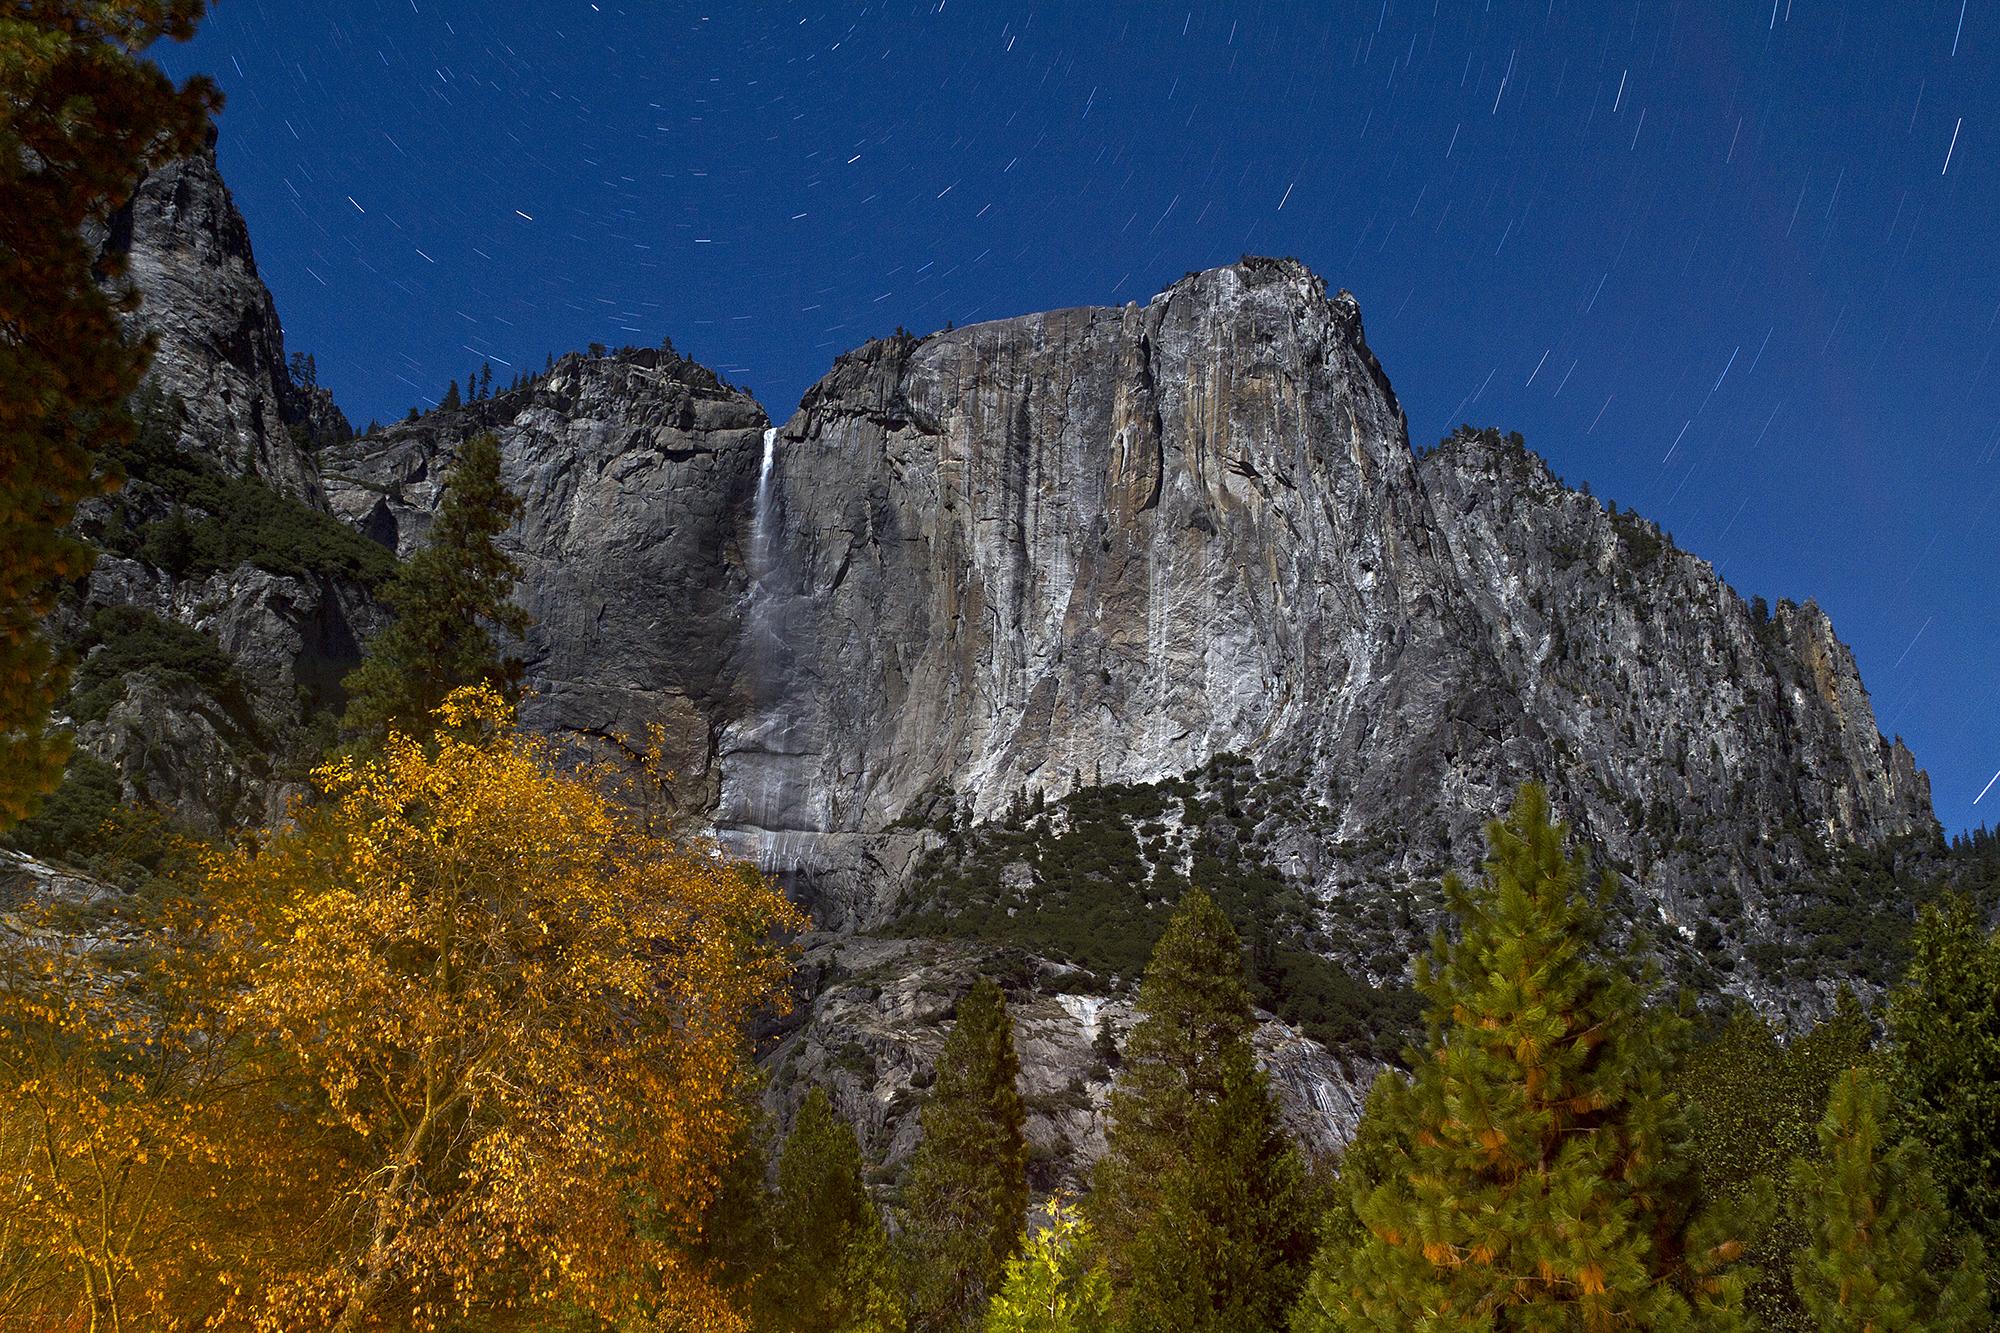 Yosemite Falls at Night, 10 Minute Exposure (2012)